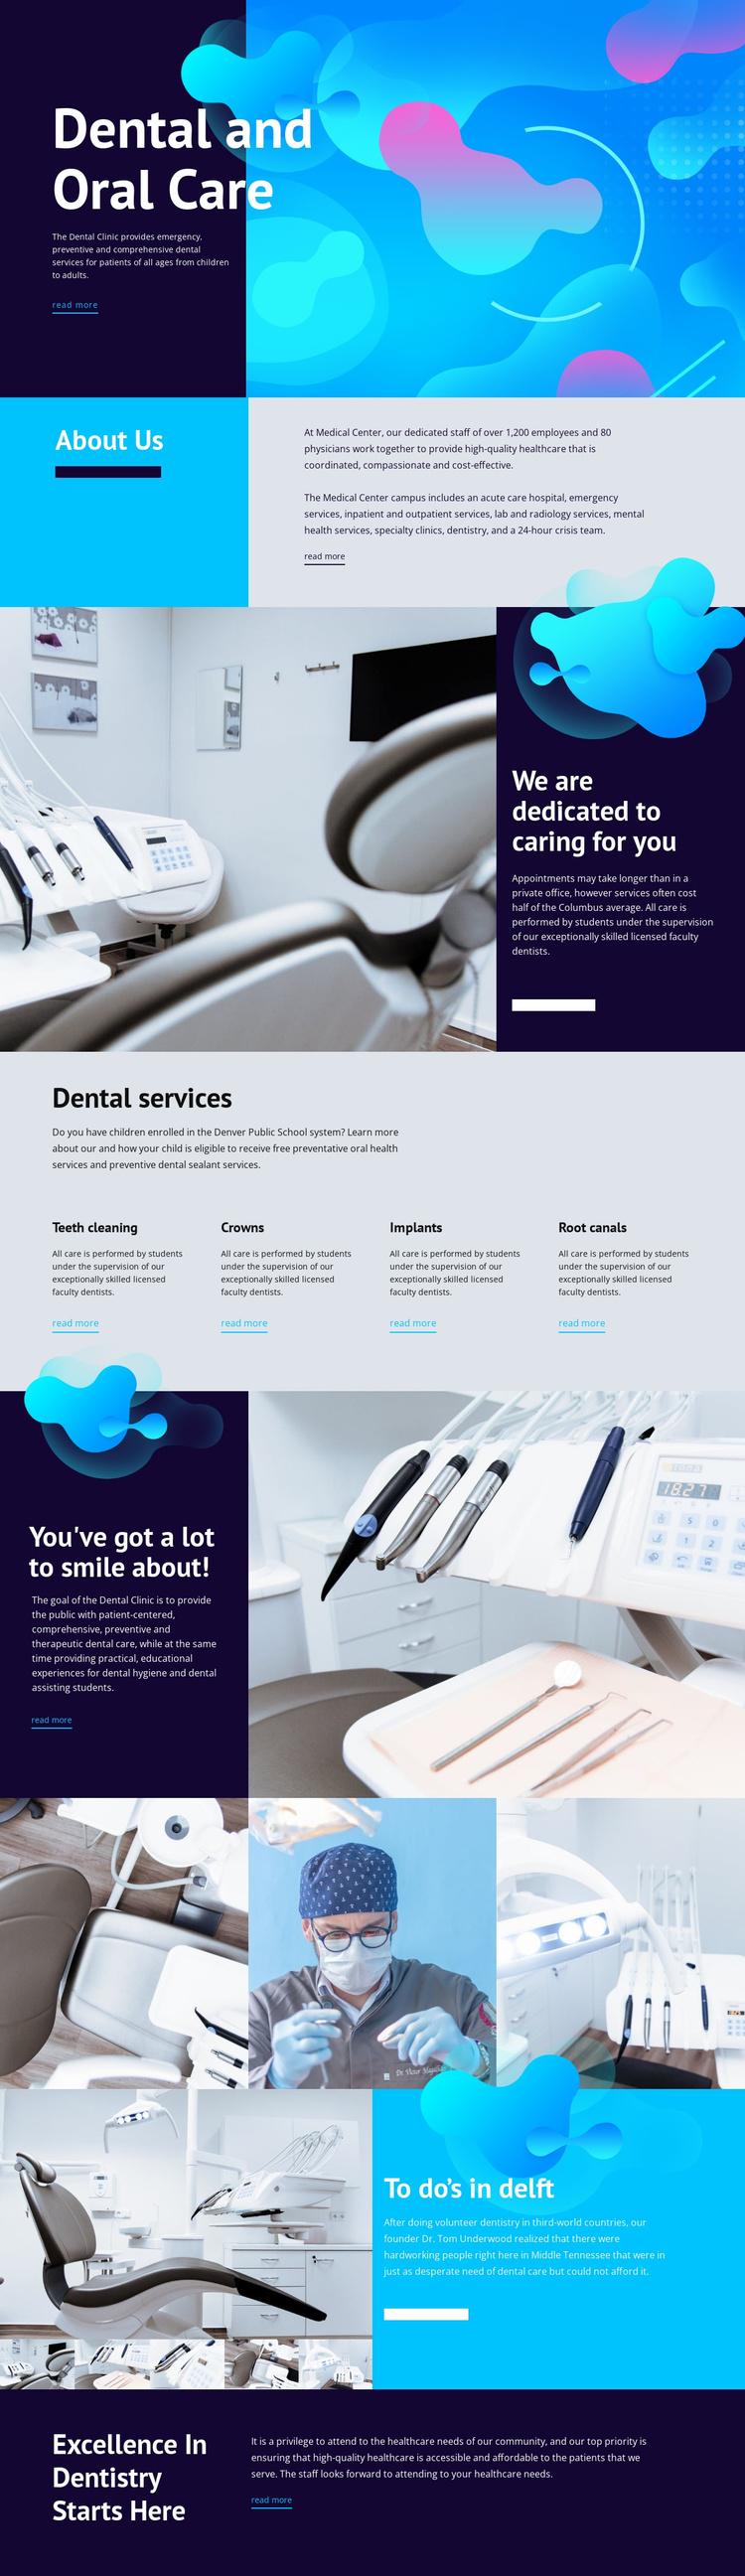 Oral care and dental medicine Joomla Template